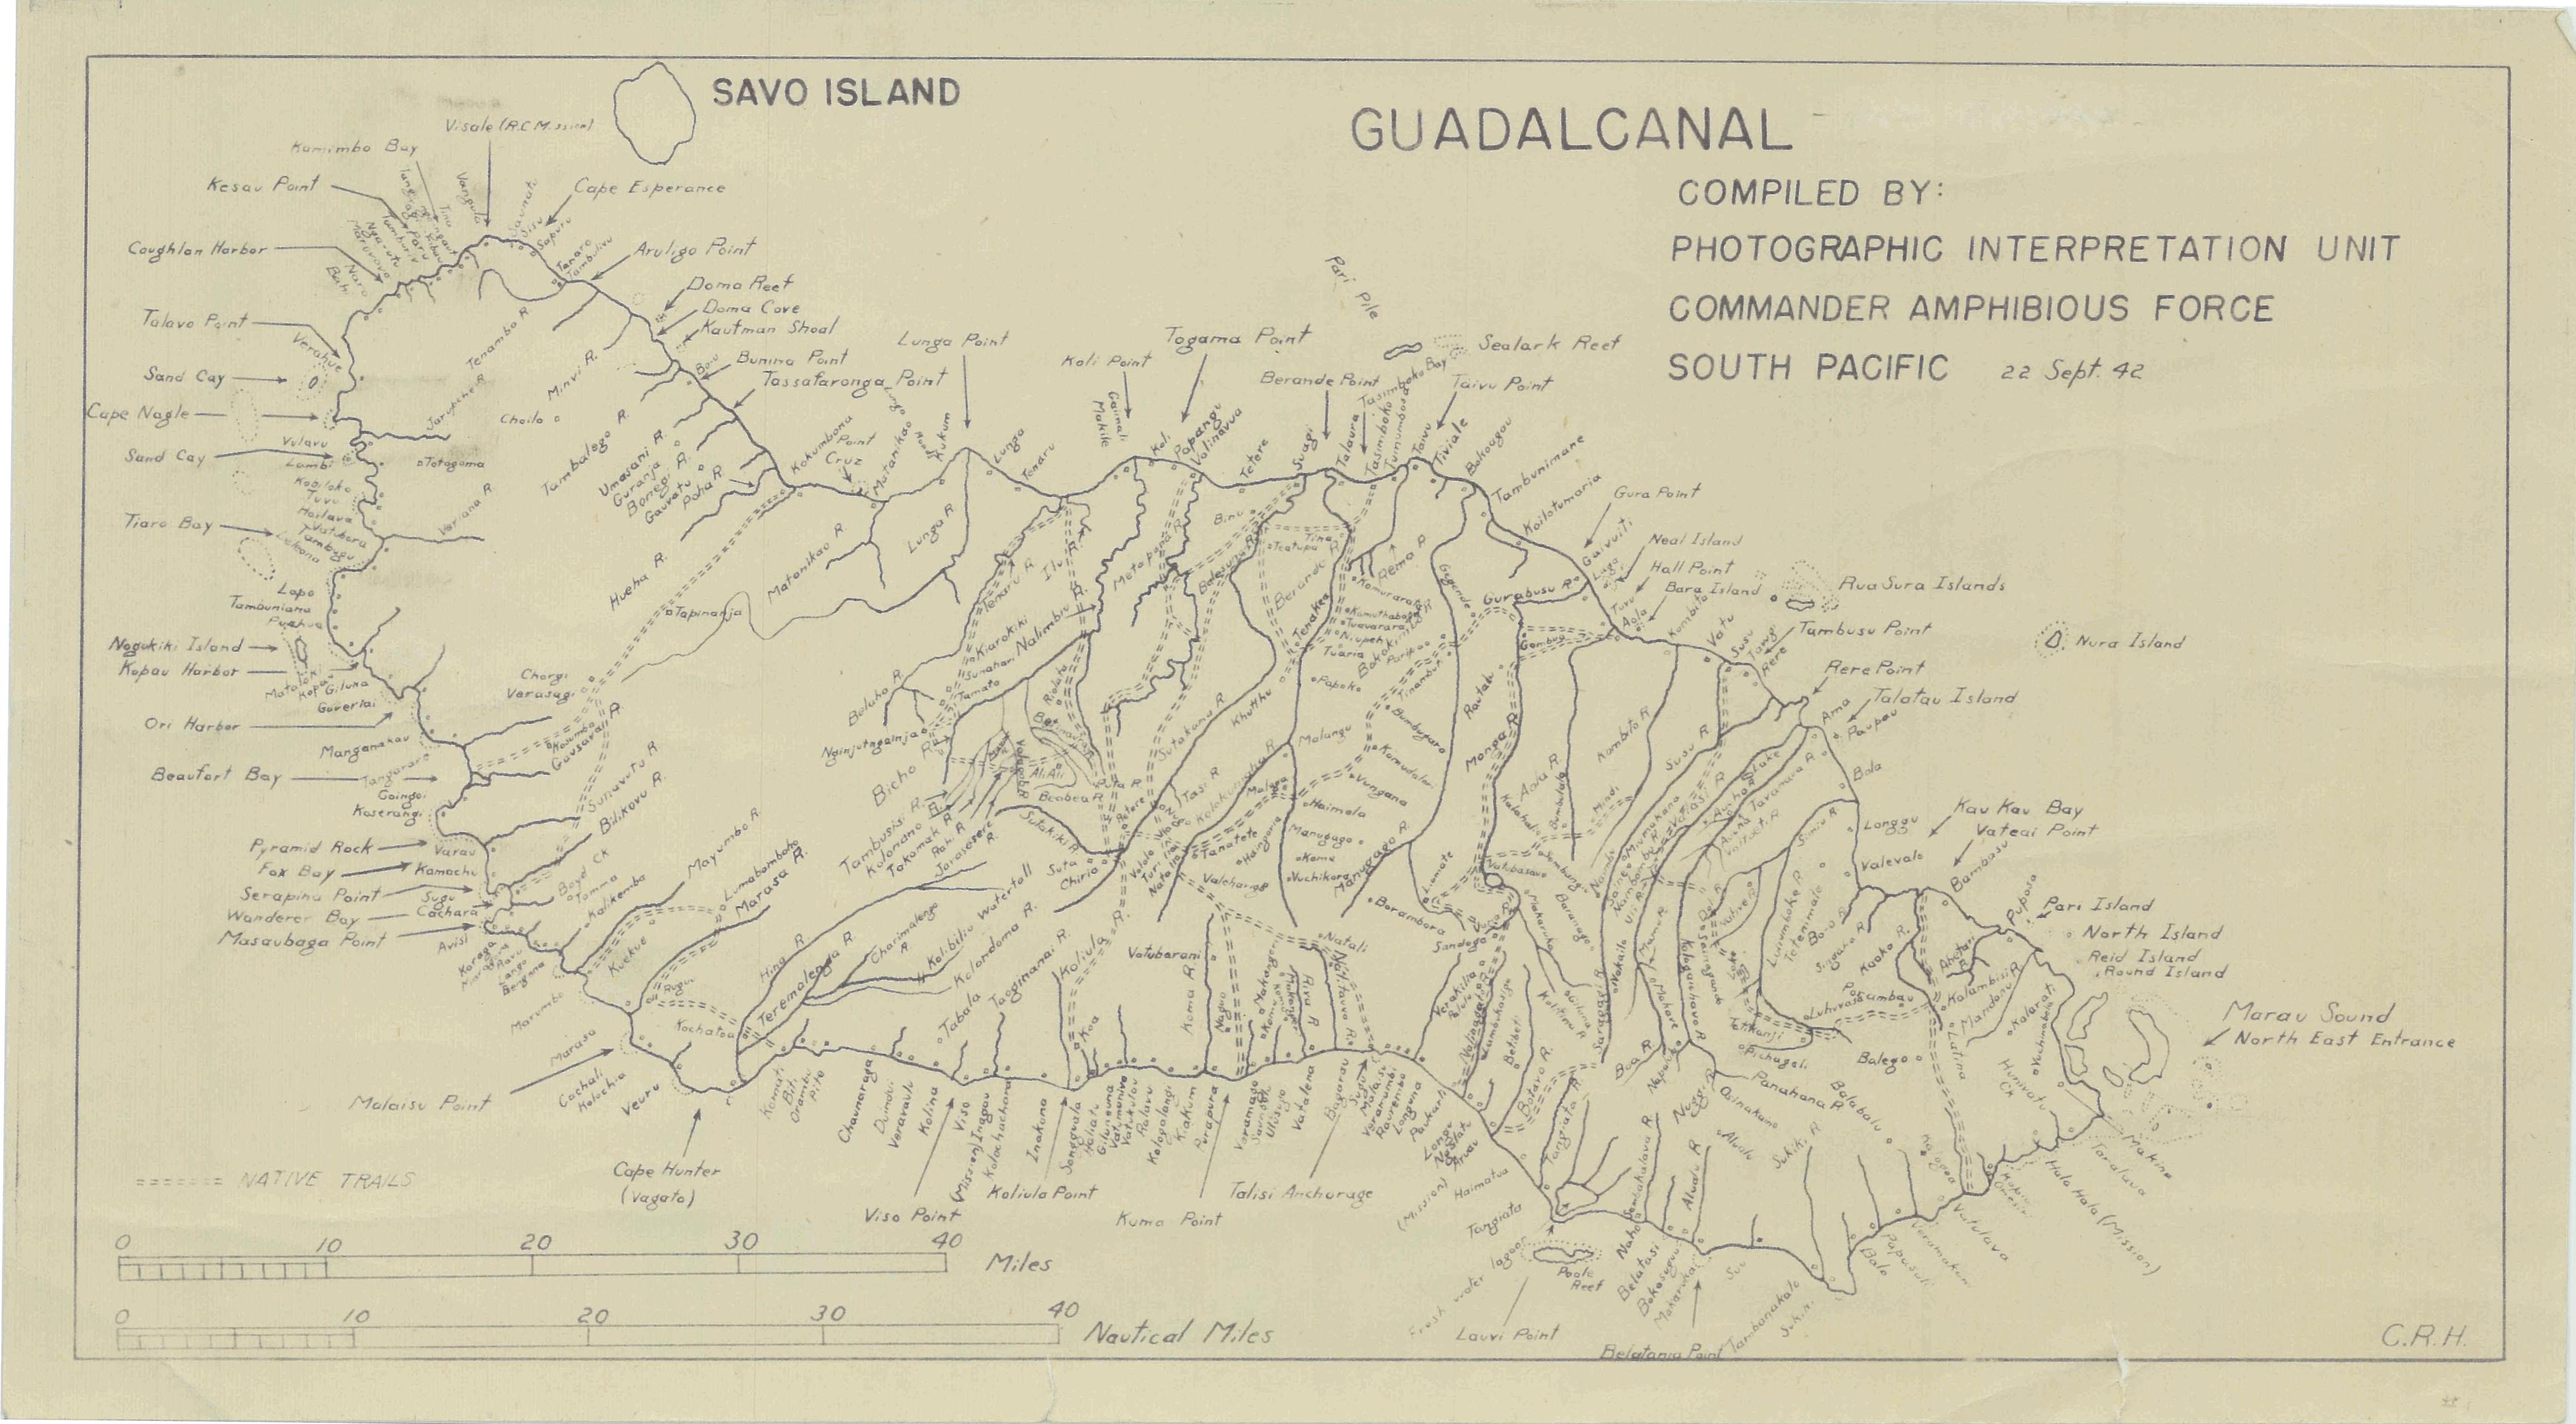 RG127_WWII_Guadalcanal_01